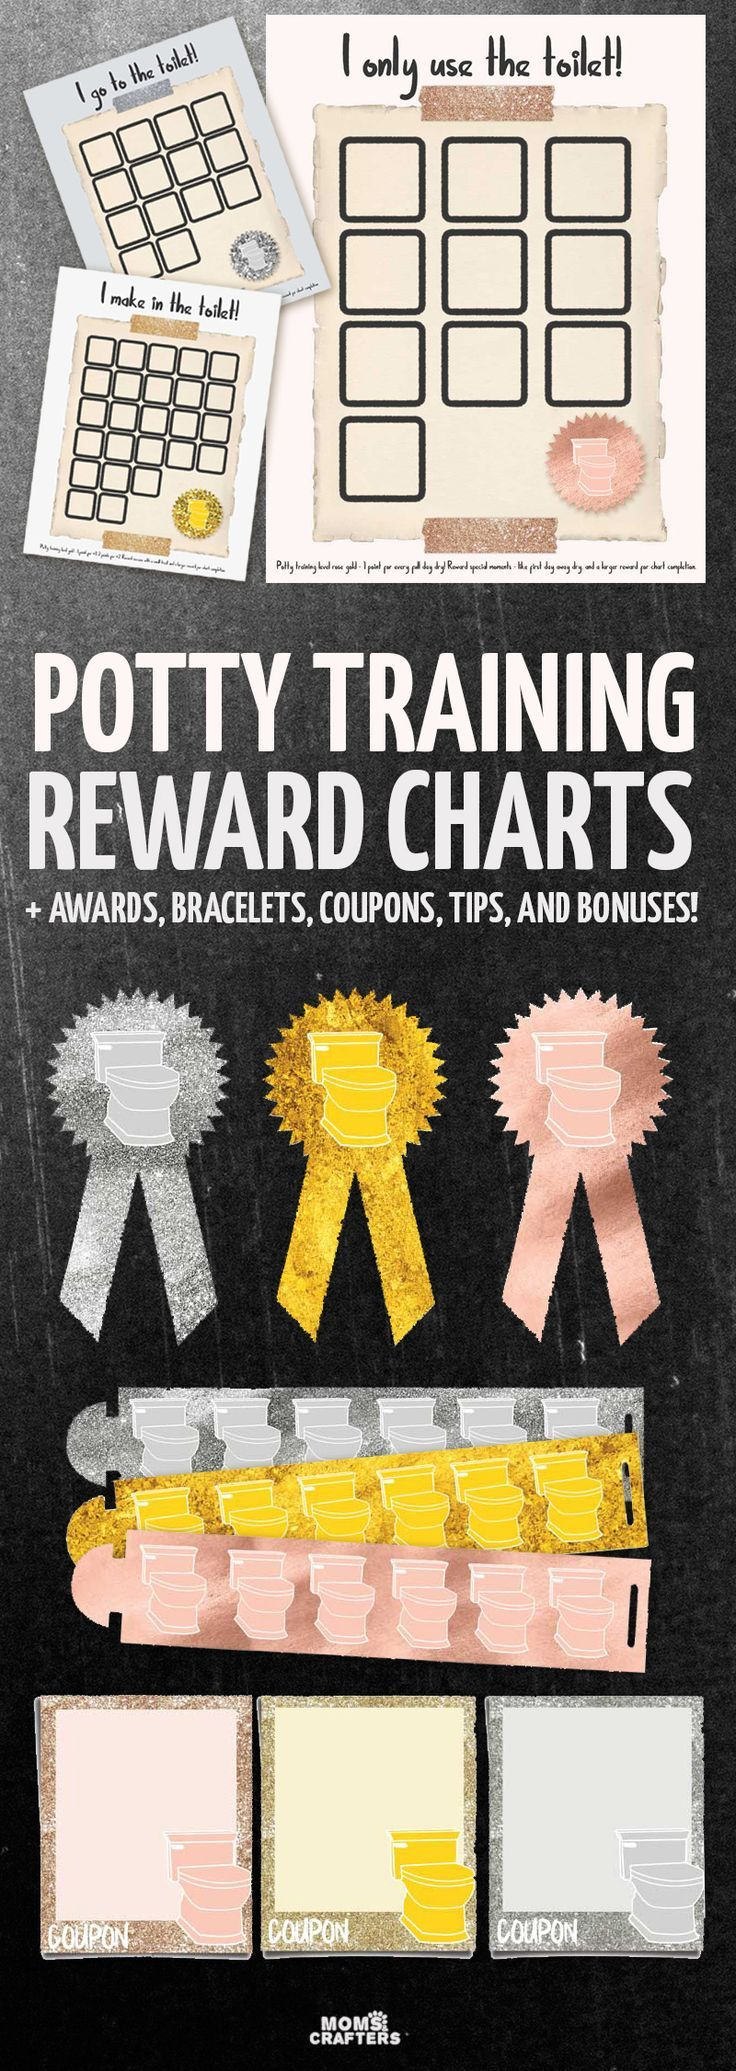 17 best ideas about potty training rewards potty 17 best ideas about potty training rewards potty training charts potty training sticker chart and potty training boys